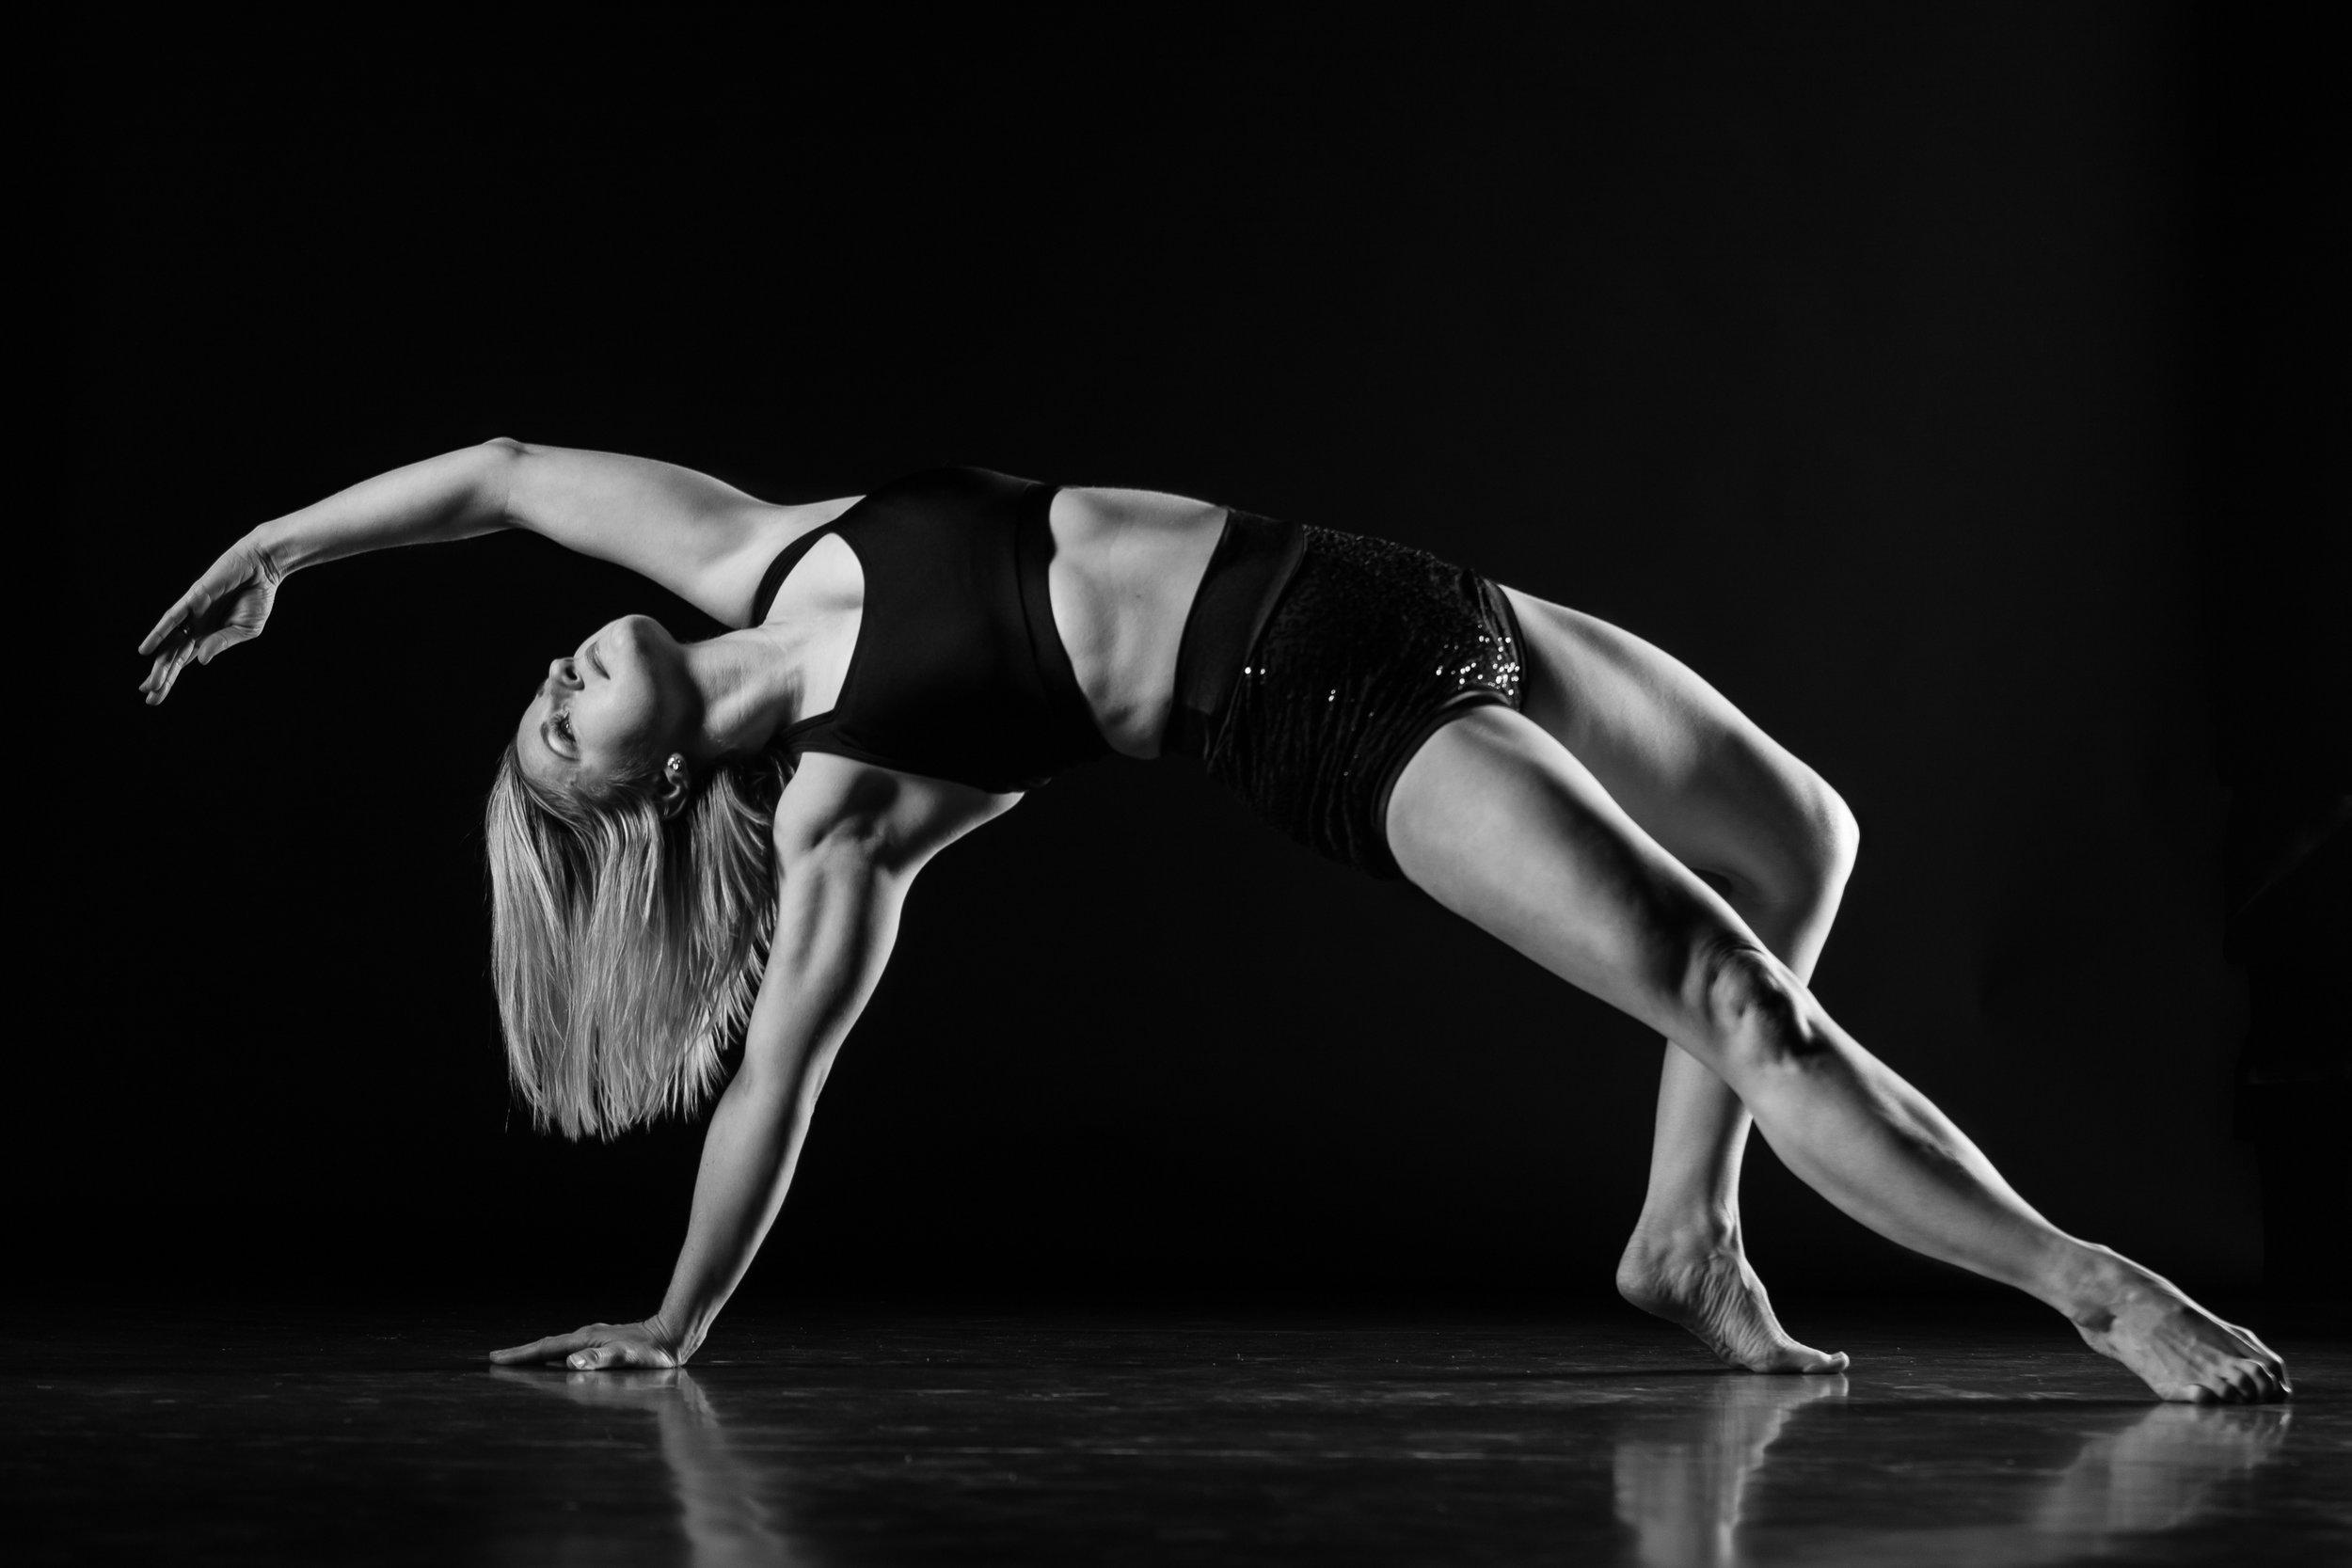 Aer portrait louisville ky fitness fine art photography